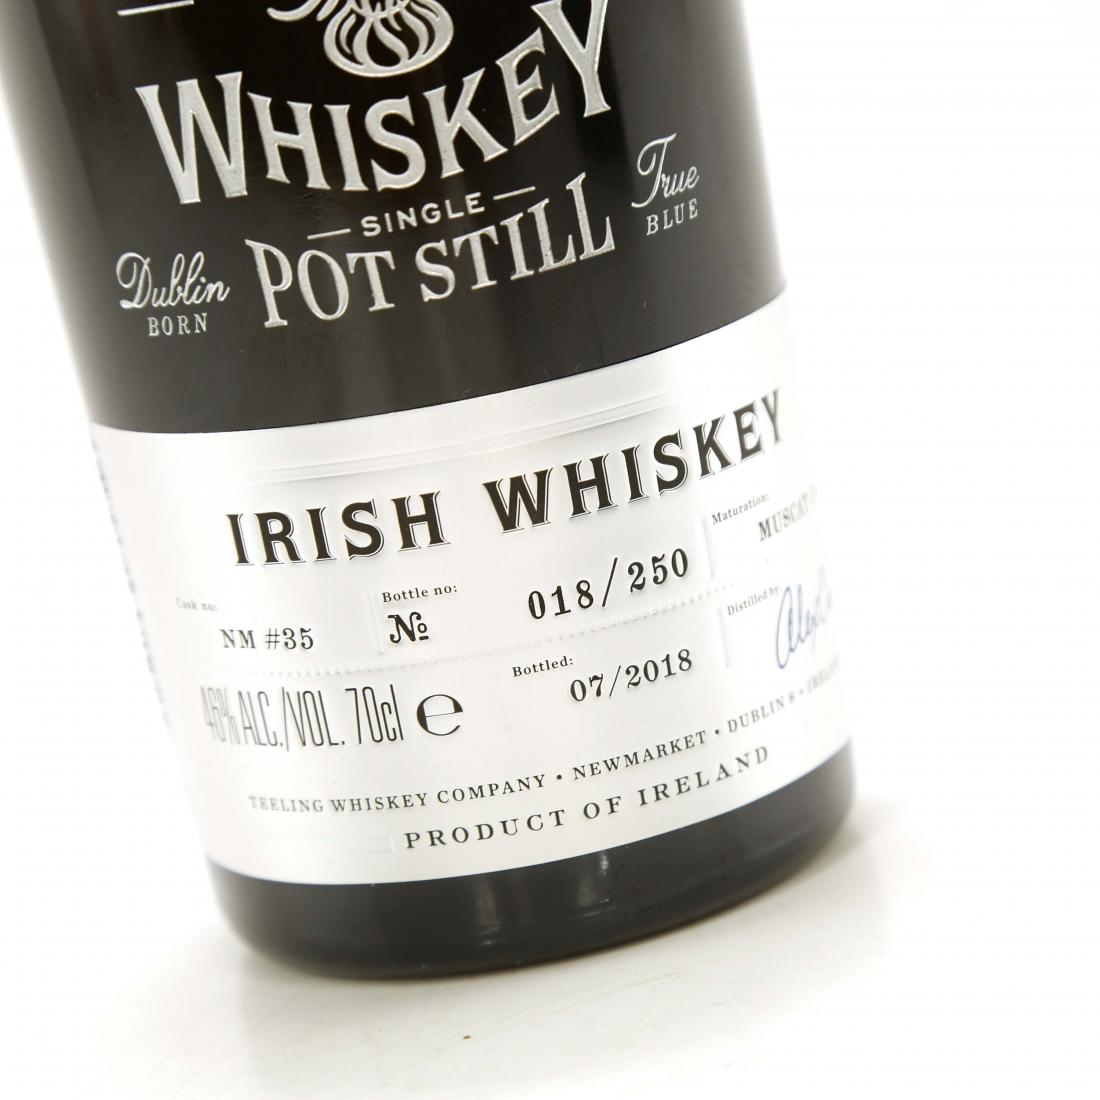 Teeling Celebratory Single Pot Still Whiskey / Bottle #018